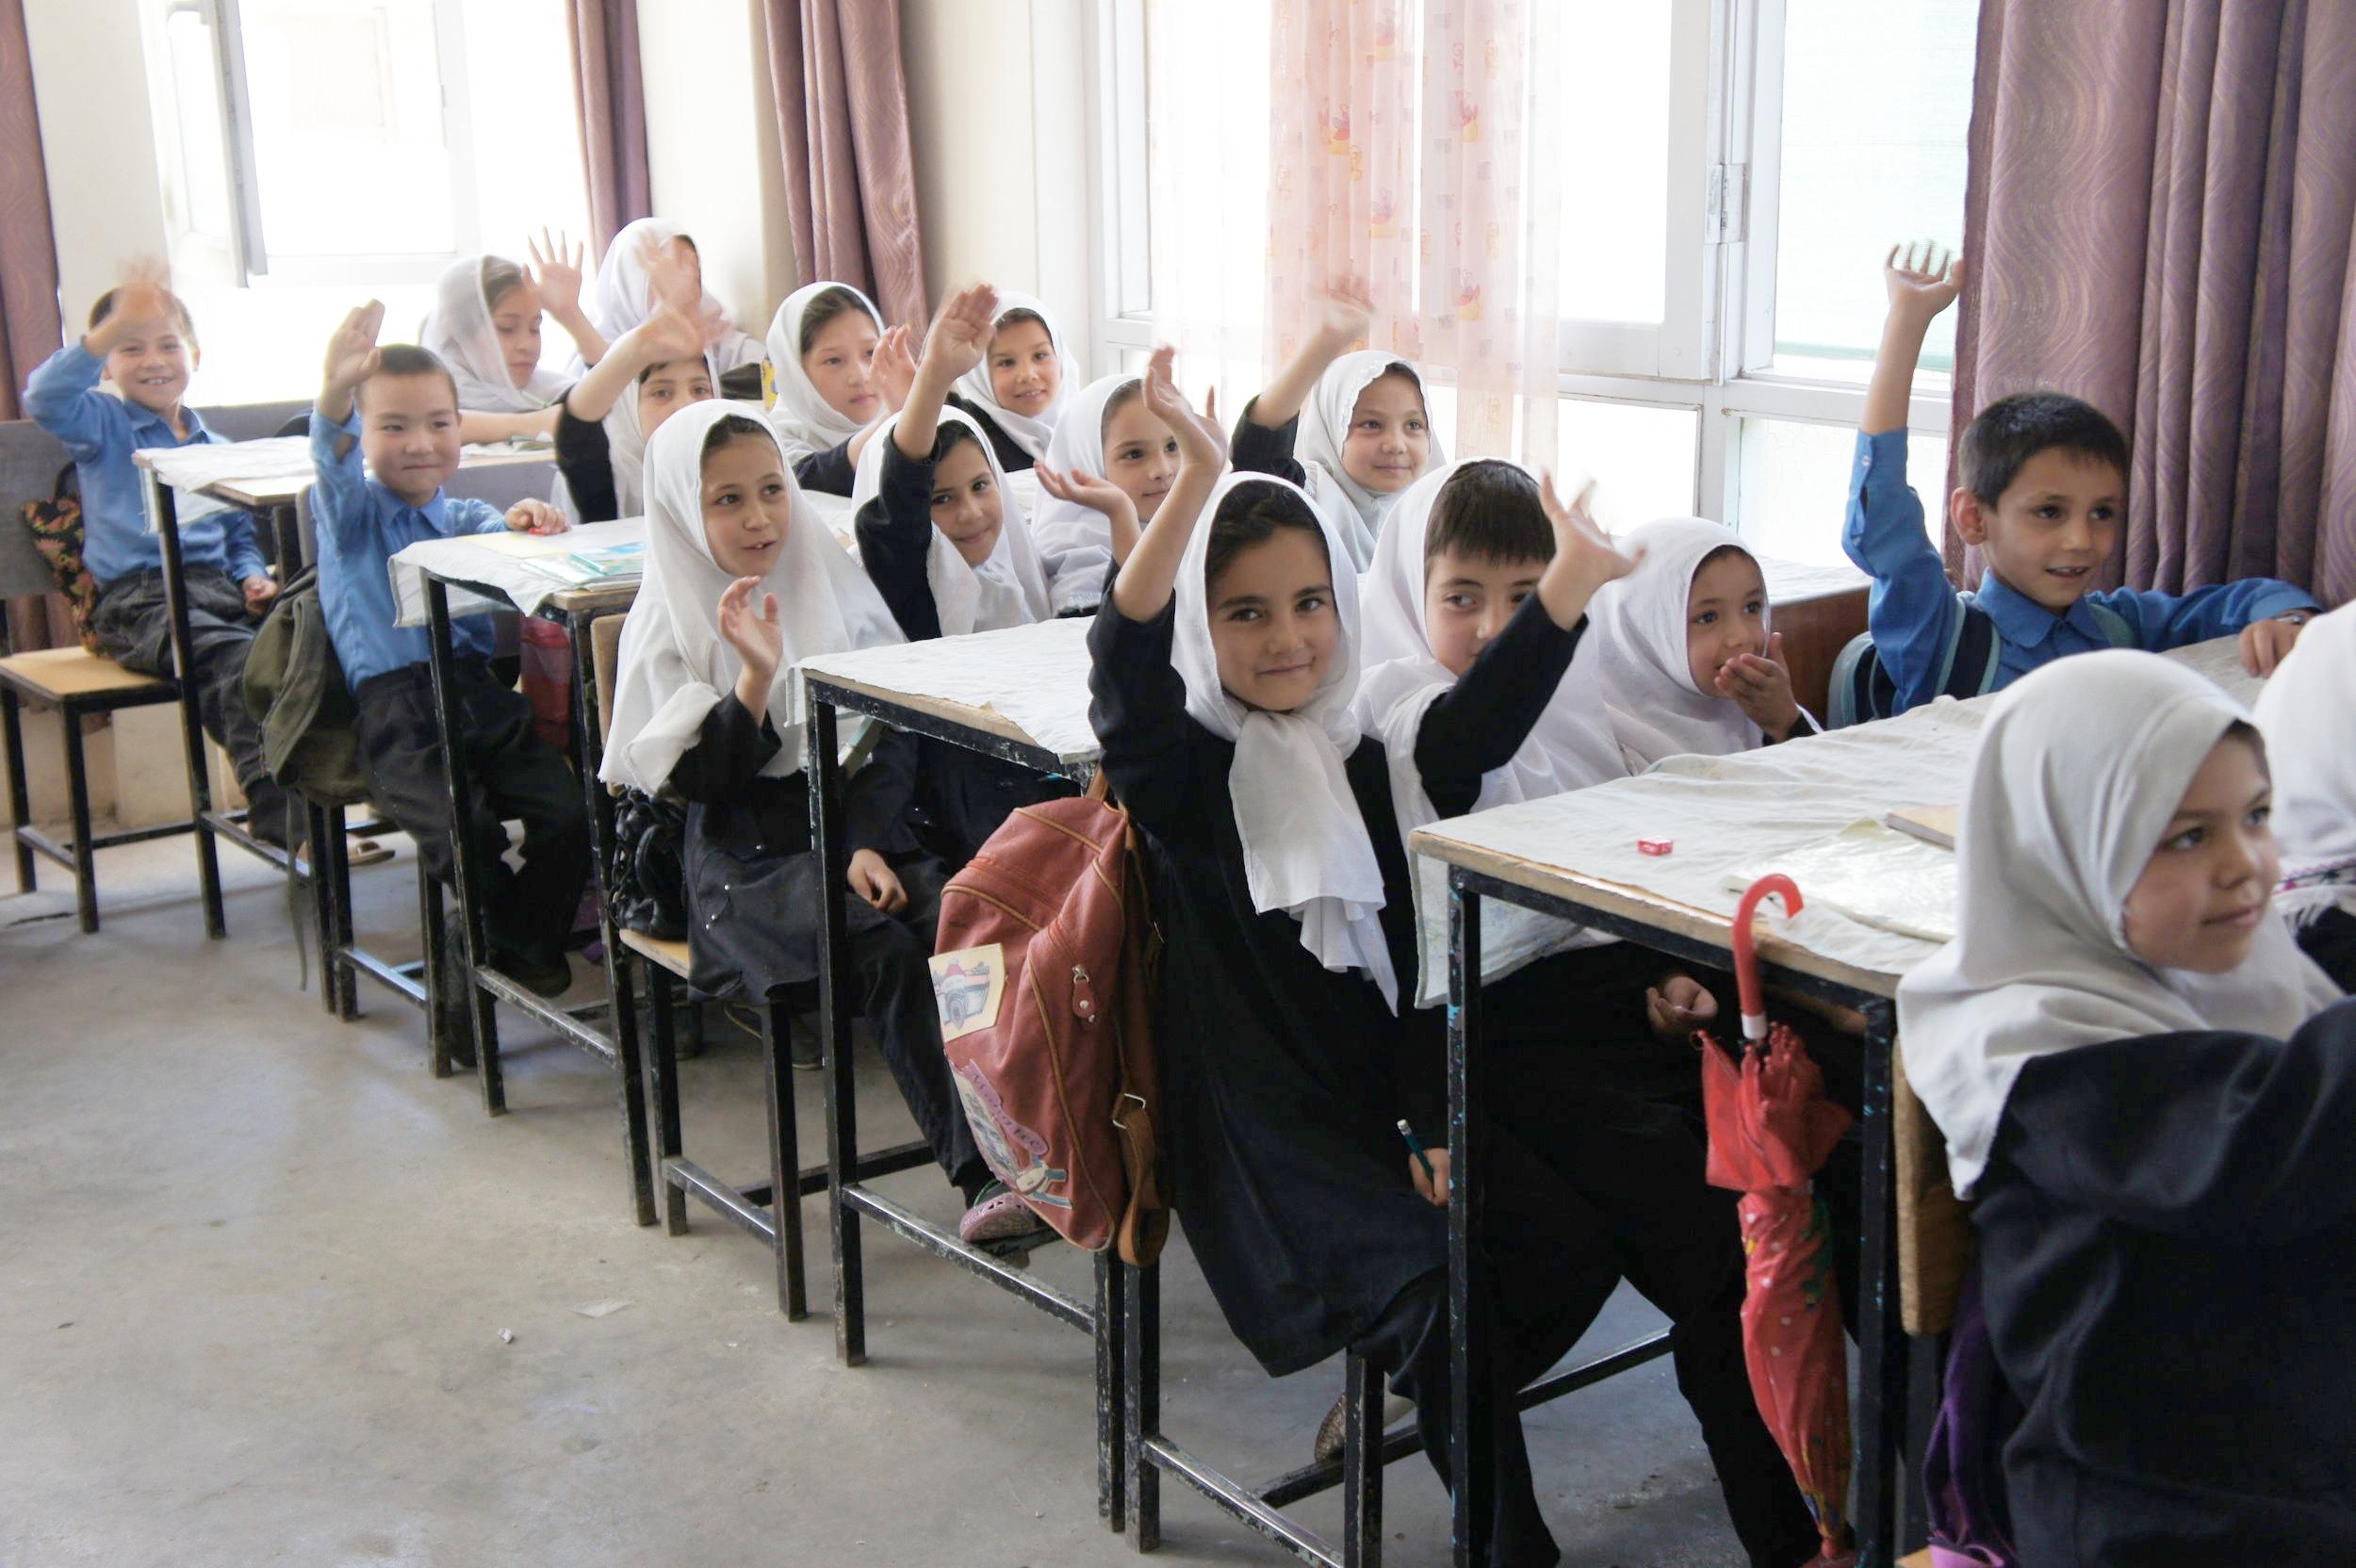 Fatima - #3020 | FemaleAge When Starting School: 8